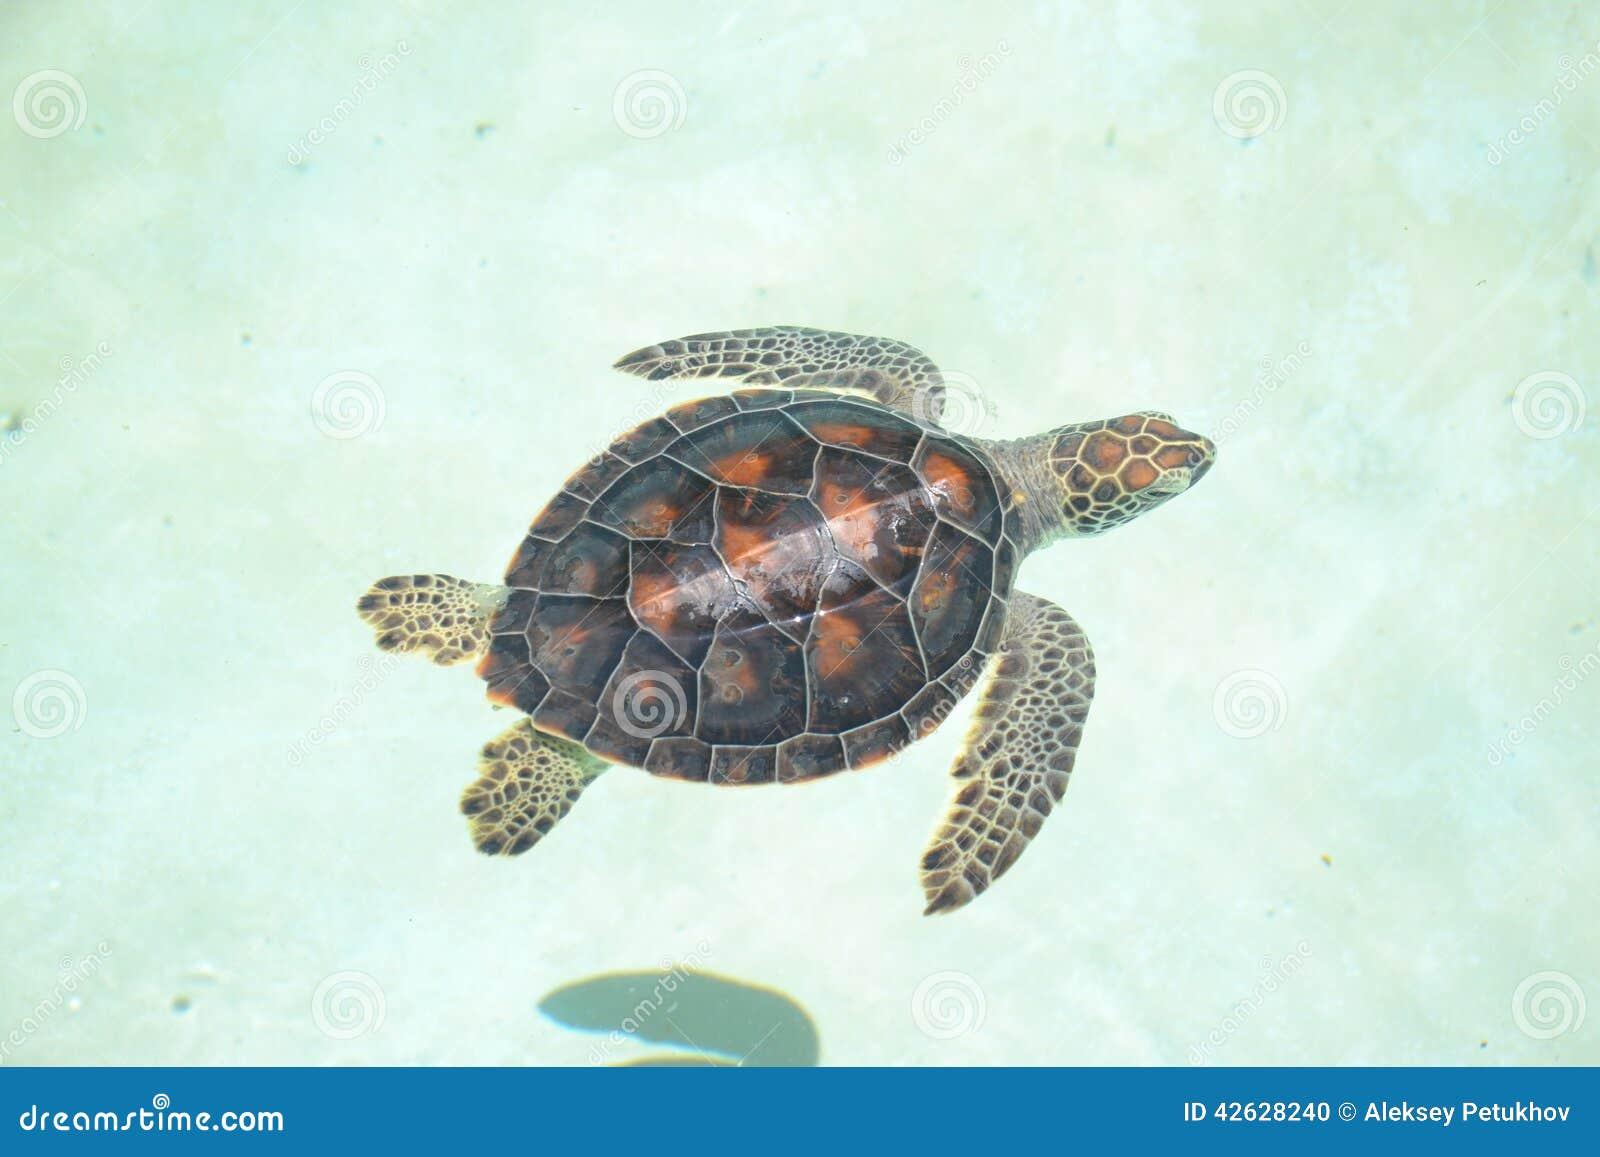 Turtle turtles life reptiles marinelife mammals